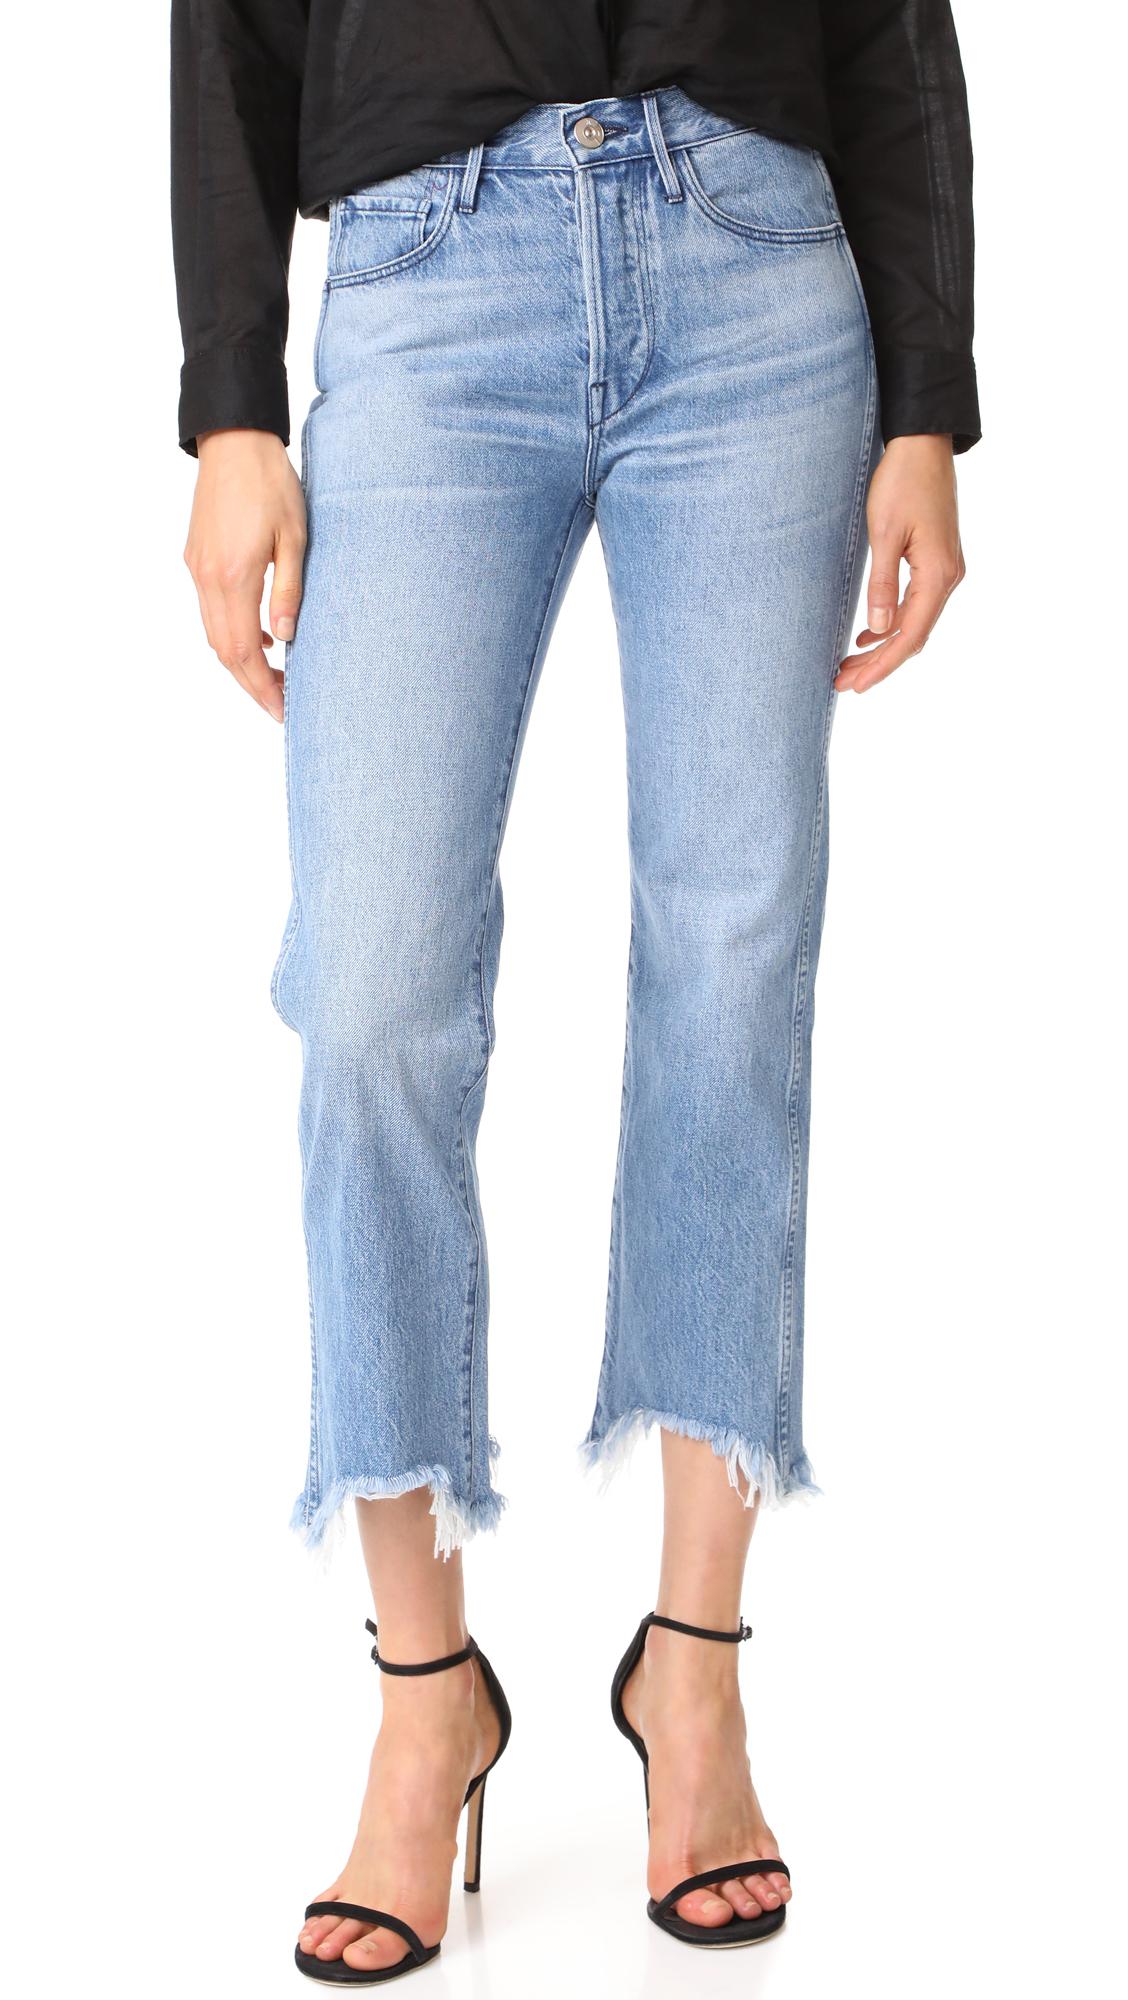 3x1 Shelter Austin Crop Jeans In Byrd